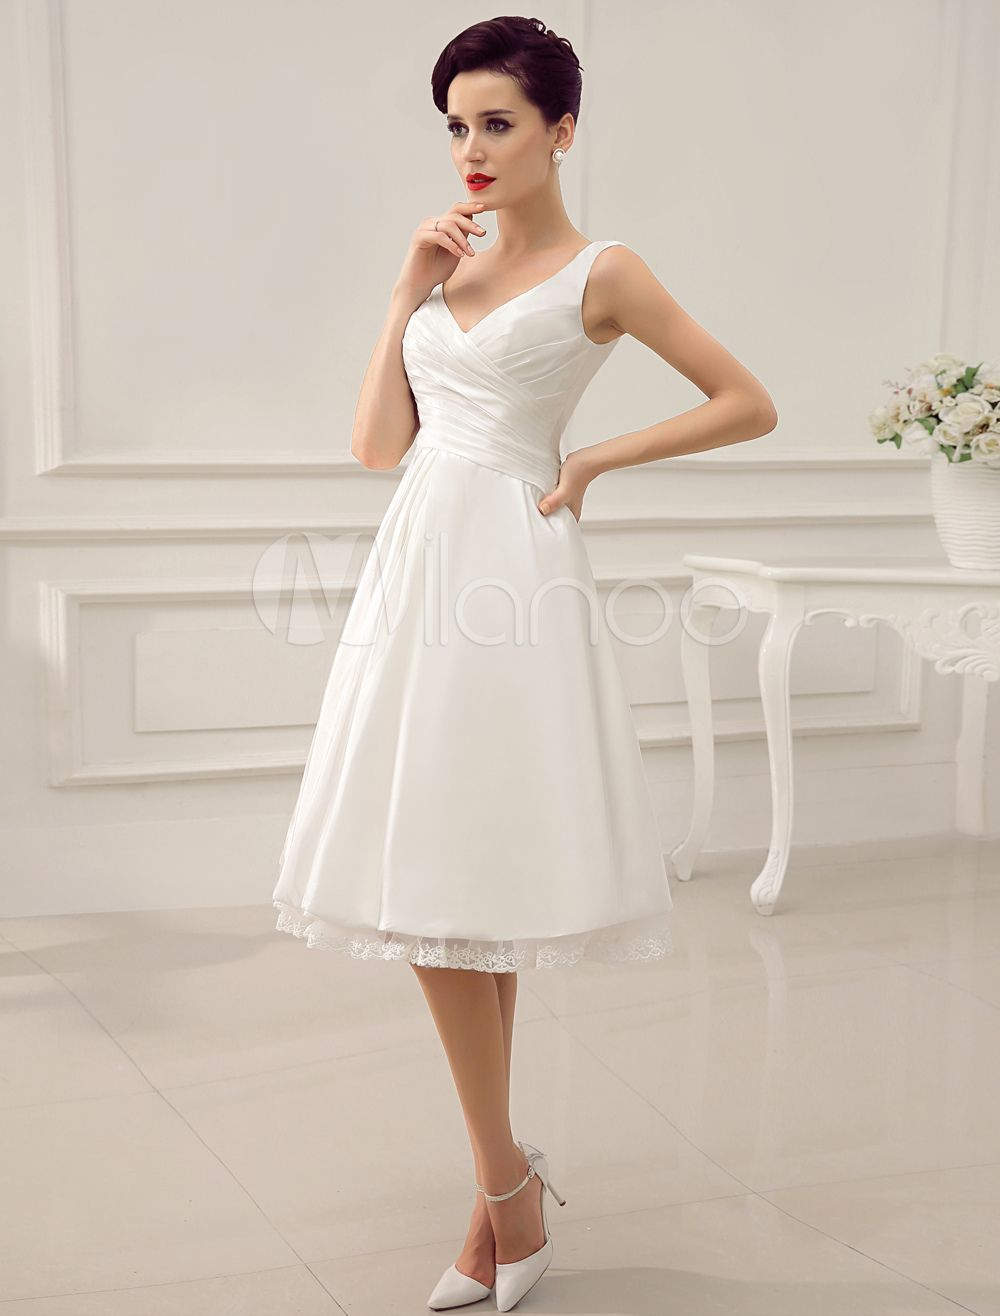 Simple Wedding Dresses Ivory Wedding Dress Knee Length Backless Straps Lace Bridal Dress Ivory Wedding Dress Knee Length Wedding Dress Civil Wedding Dresses [ 1316 x 1000 Pixel ]